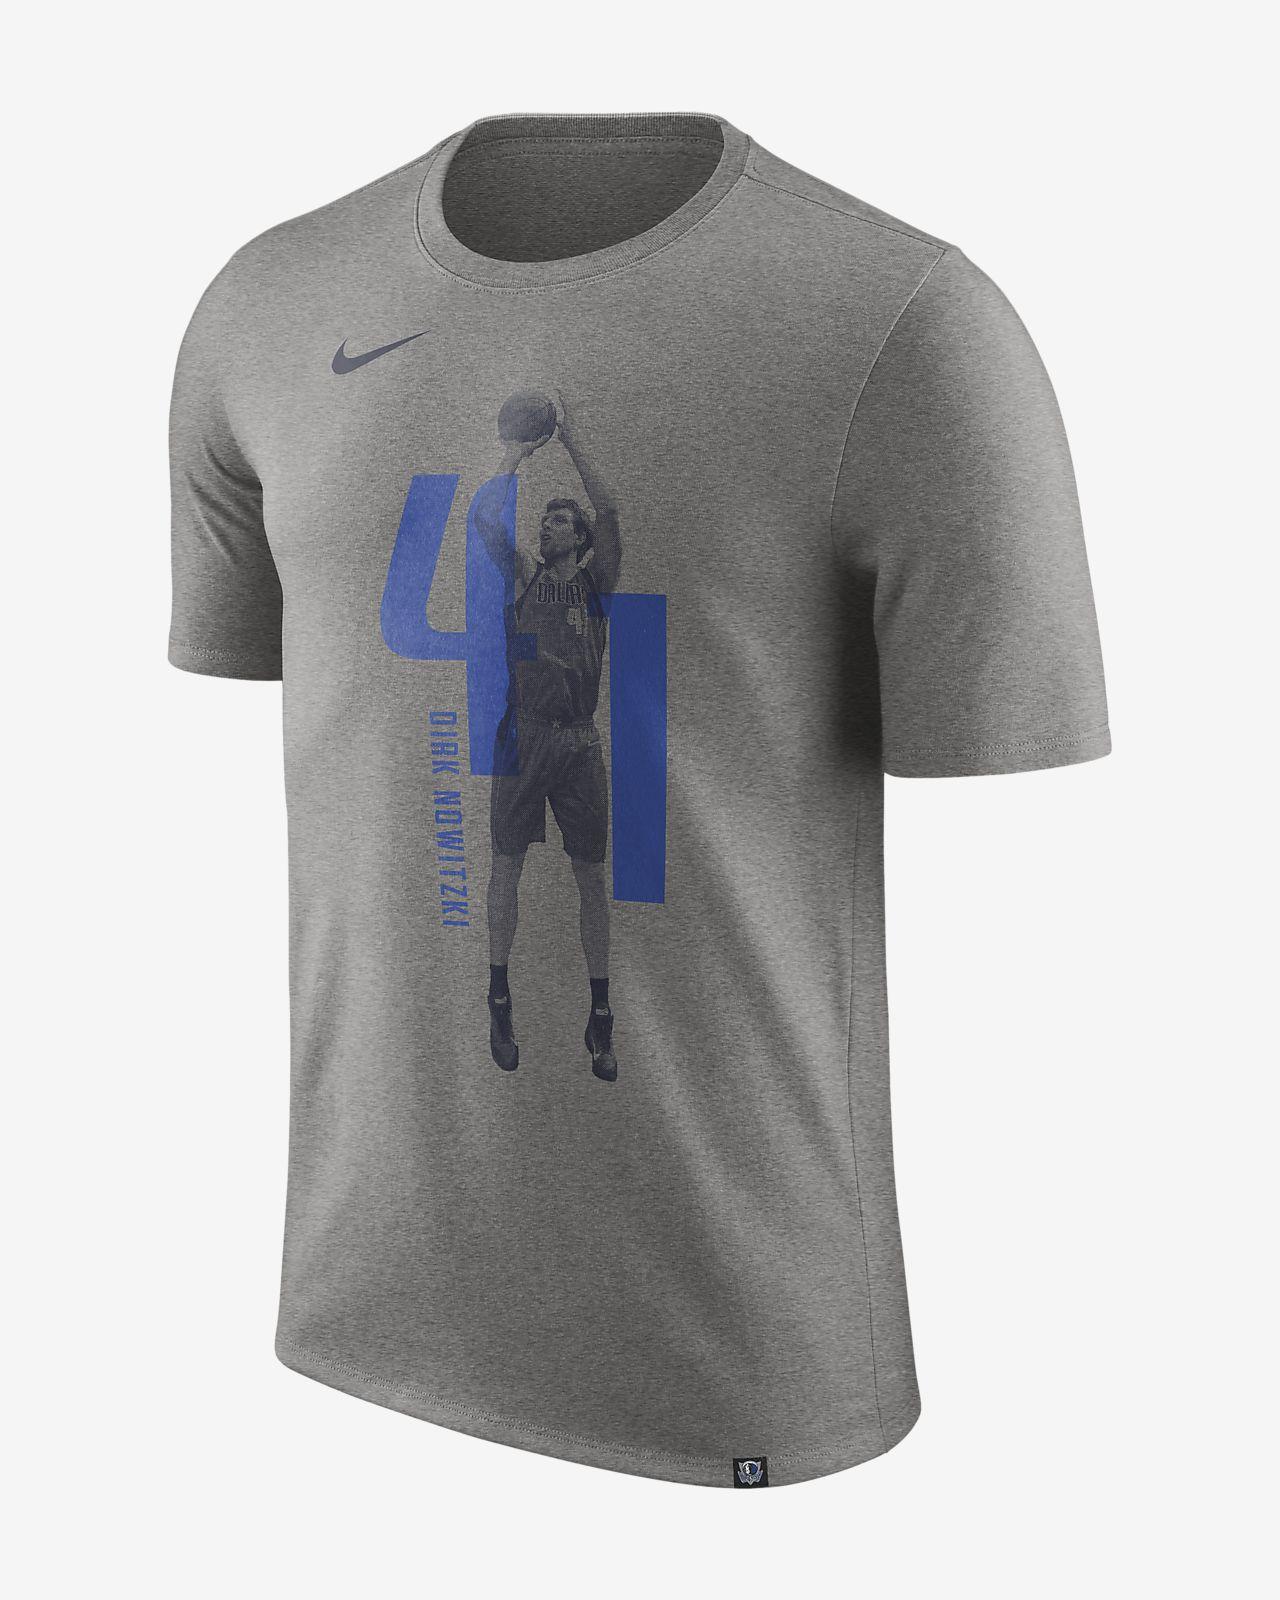 Tee-shirt NBA Dirk Nowitzki Dallas Mavericks Nike Dry pour Homme